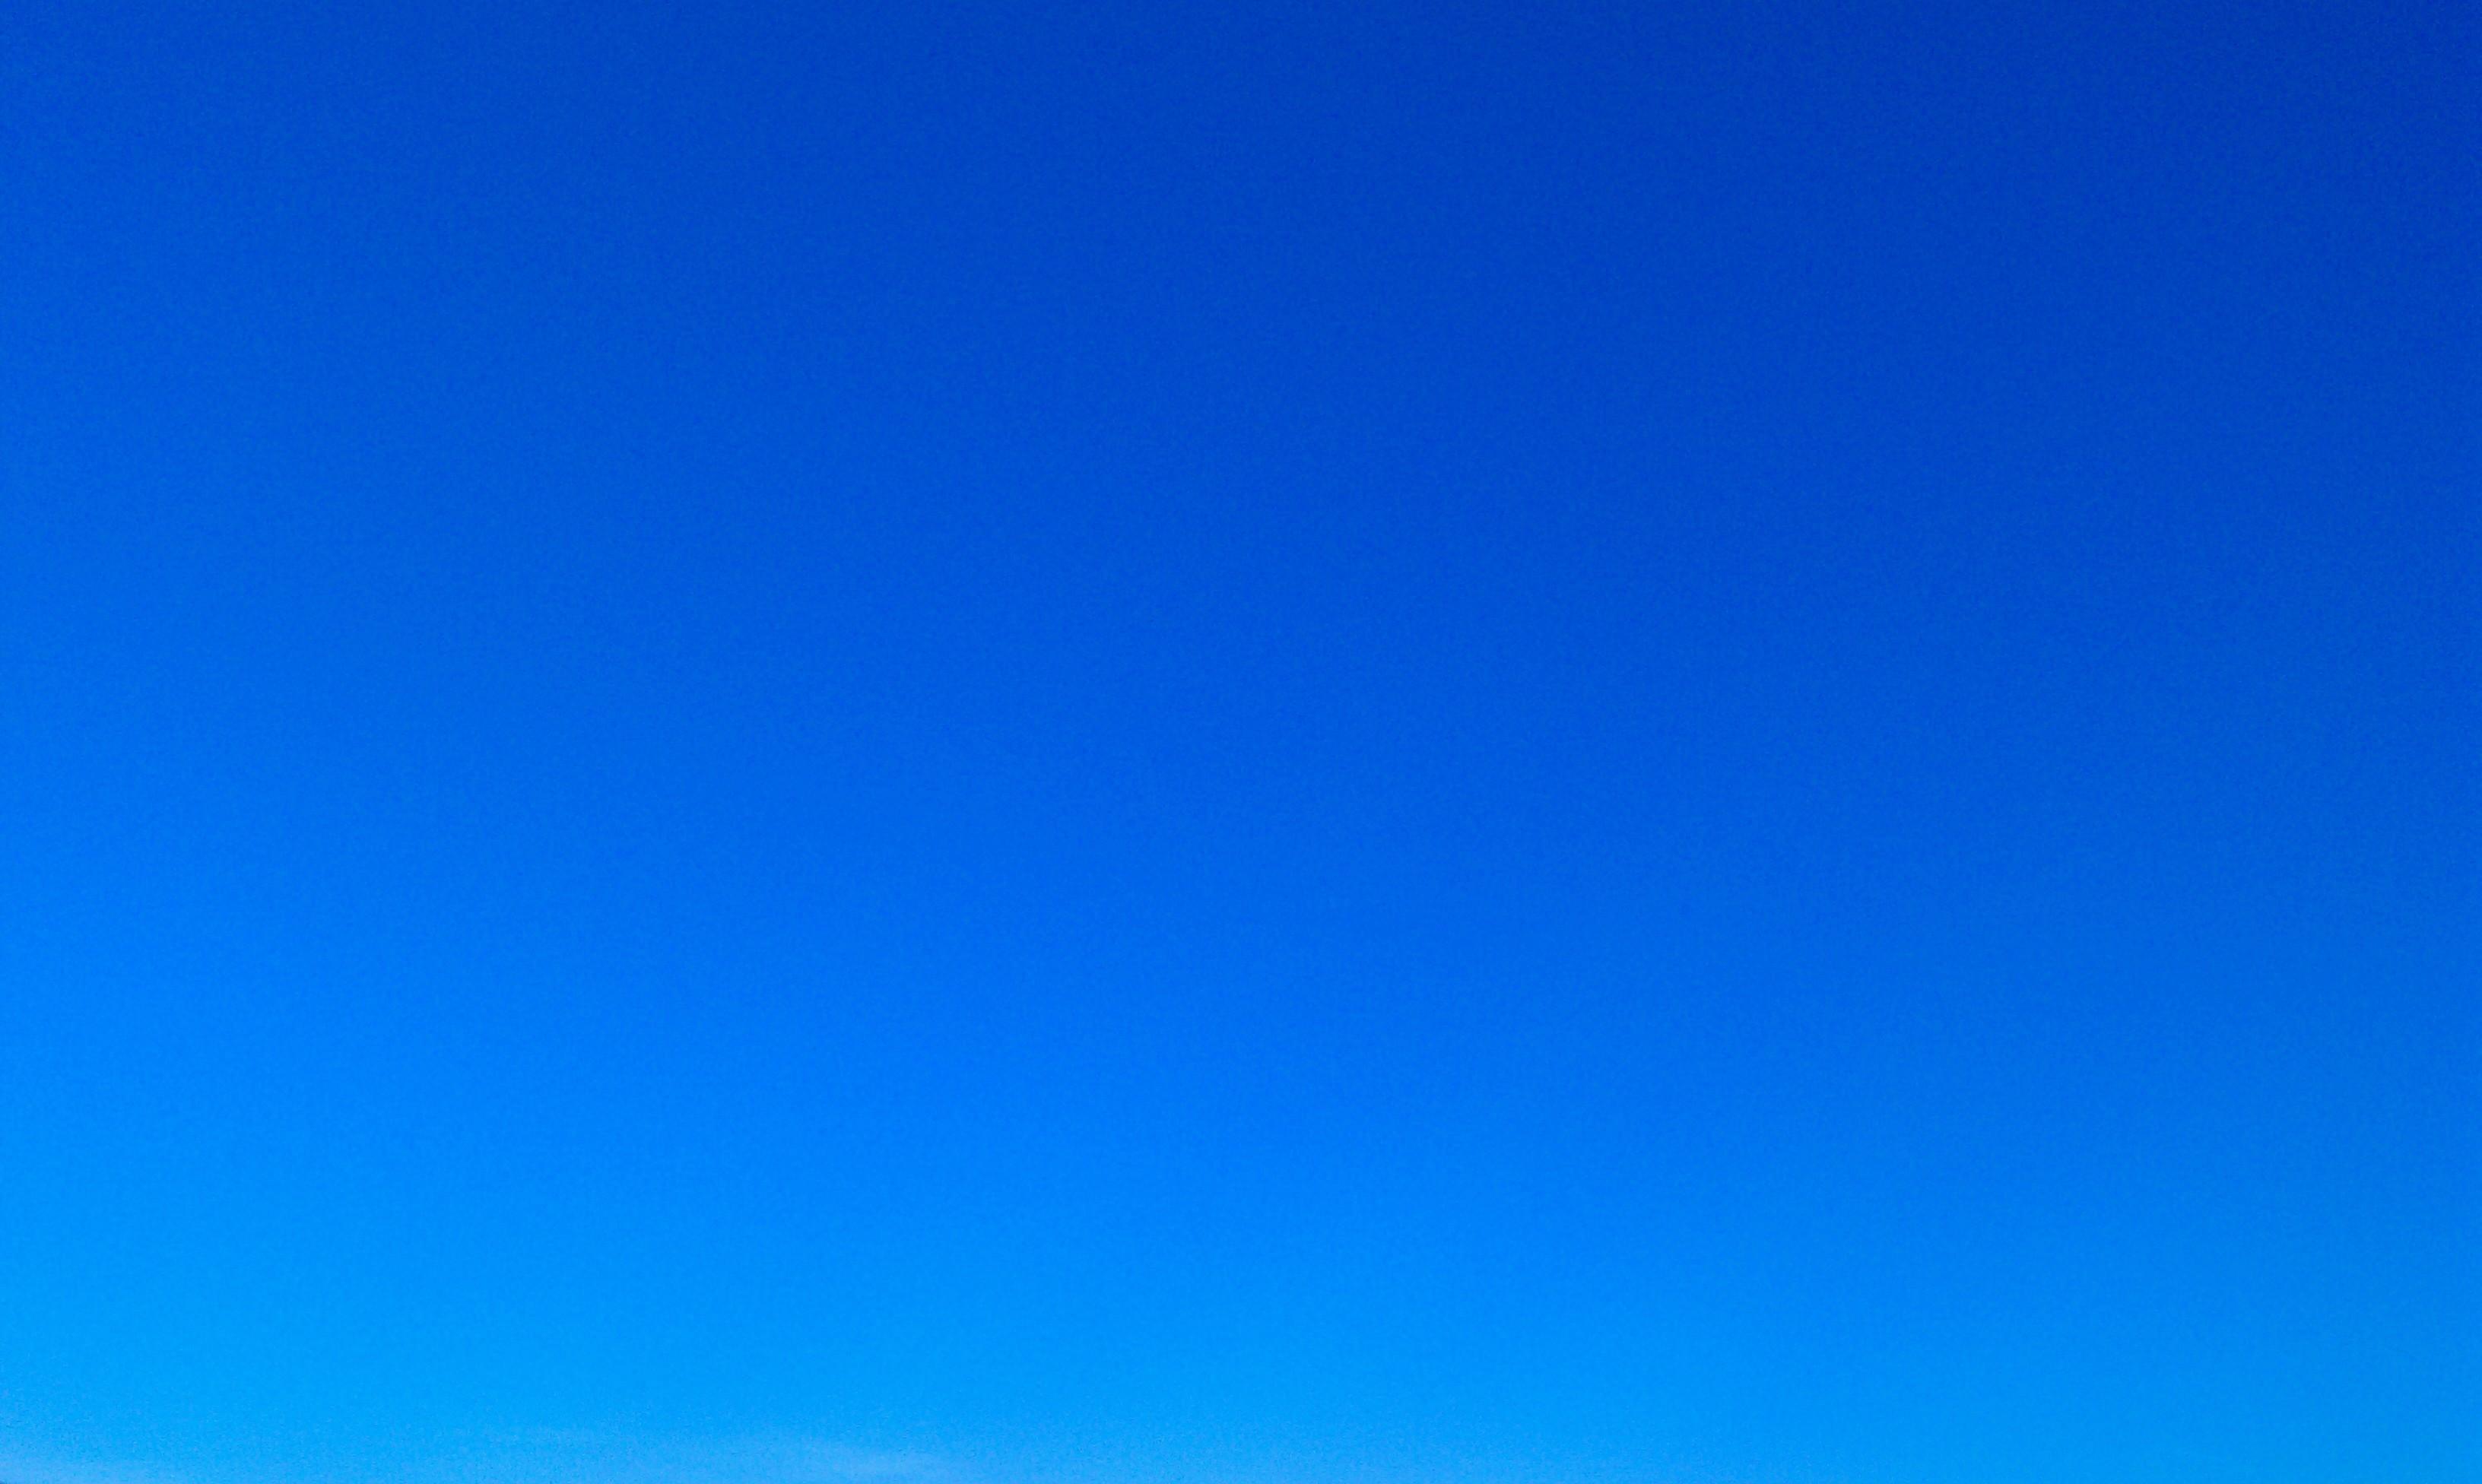 3264x1952, Blue Sky Wallpapers Hd   Data Id 167407 - Blue Sky Wallpaper Hd , HD Wallpaper & Backgrounds